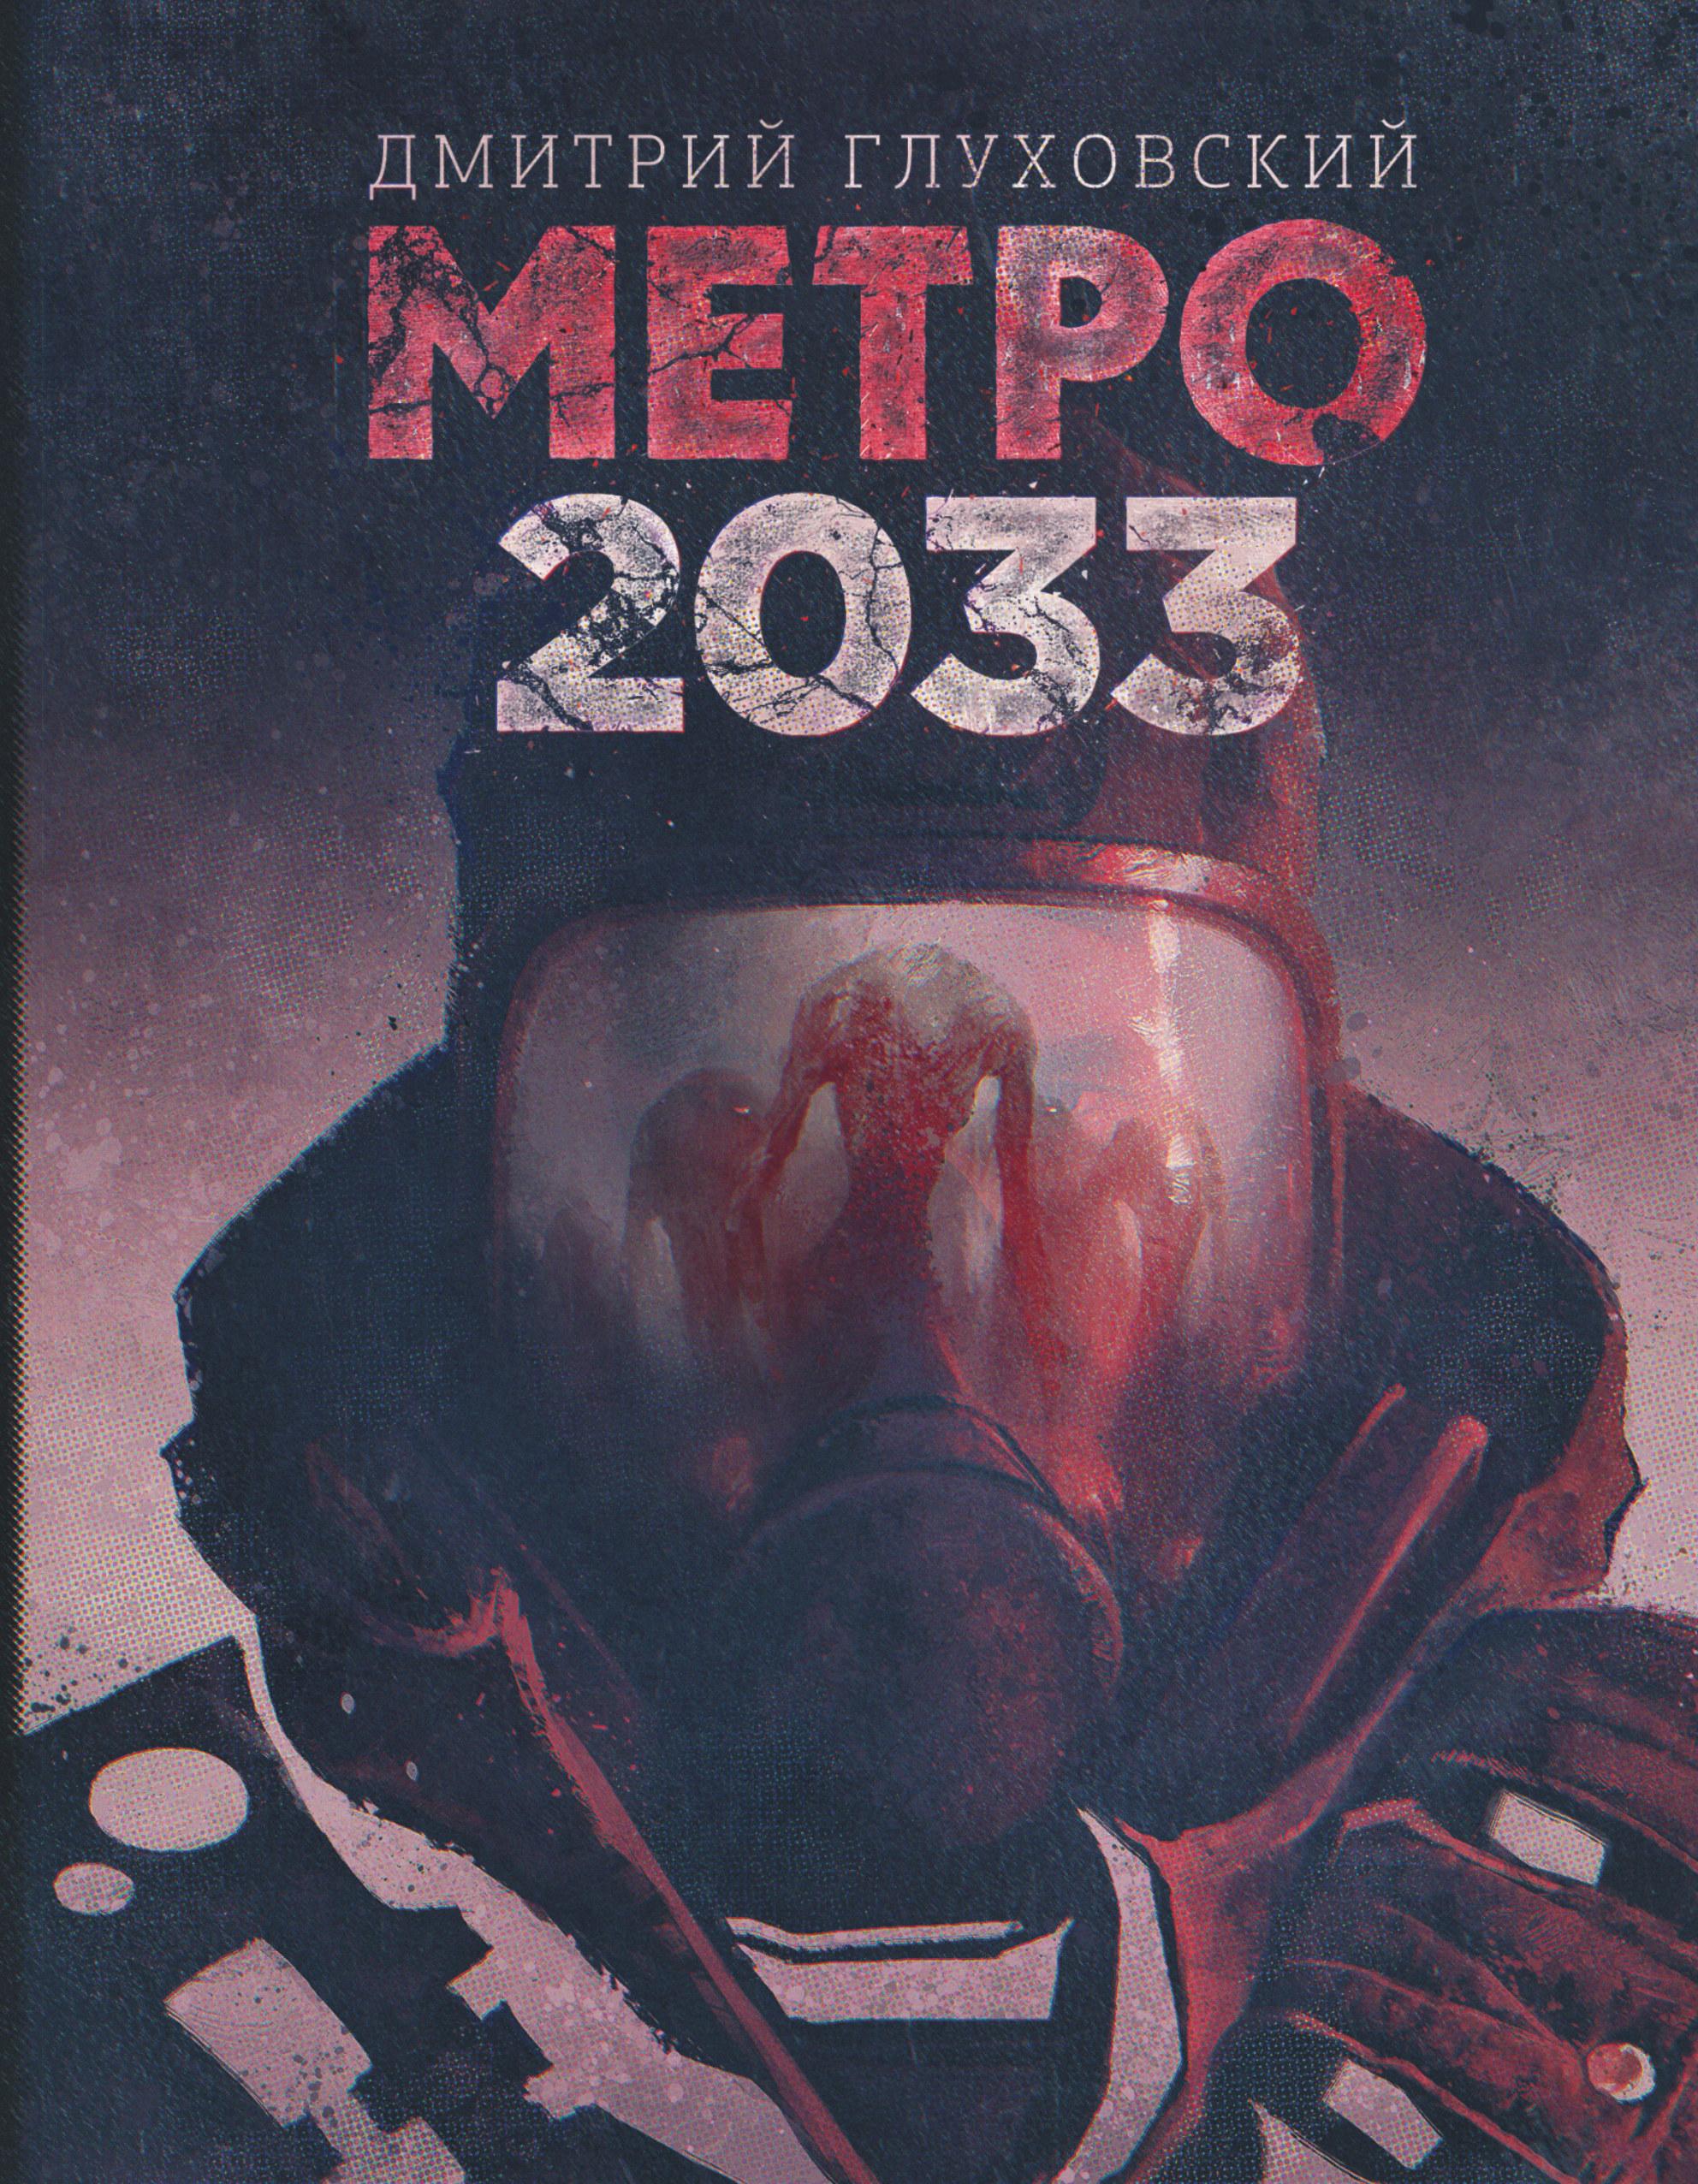 Глуховский Д.А. Метро 2033 метро 2033 метро 2034 метро 2035